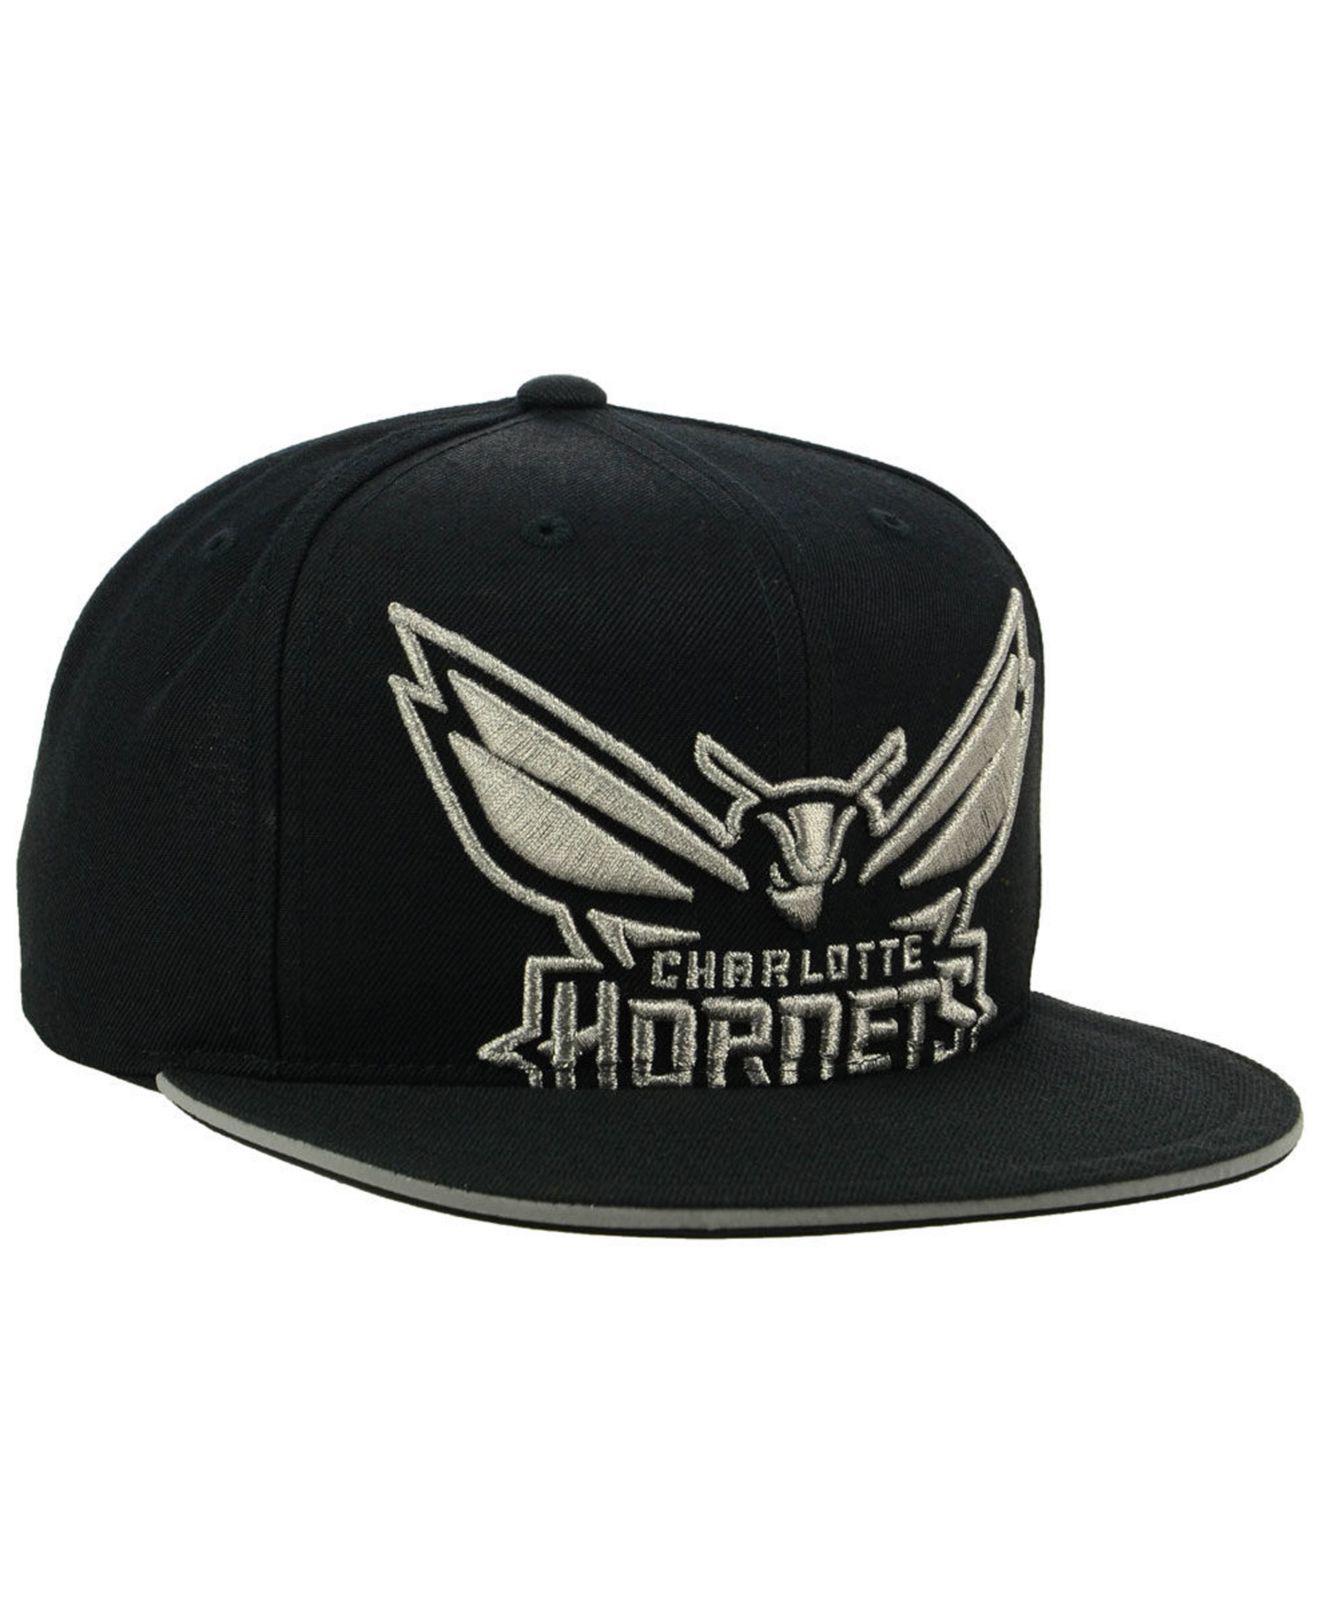 new arrival 1fe1e db73a ... wholesale mitchell ness black charlotte hornets cropped metallic snapback  cap for men lyst. view fullscreen